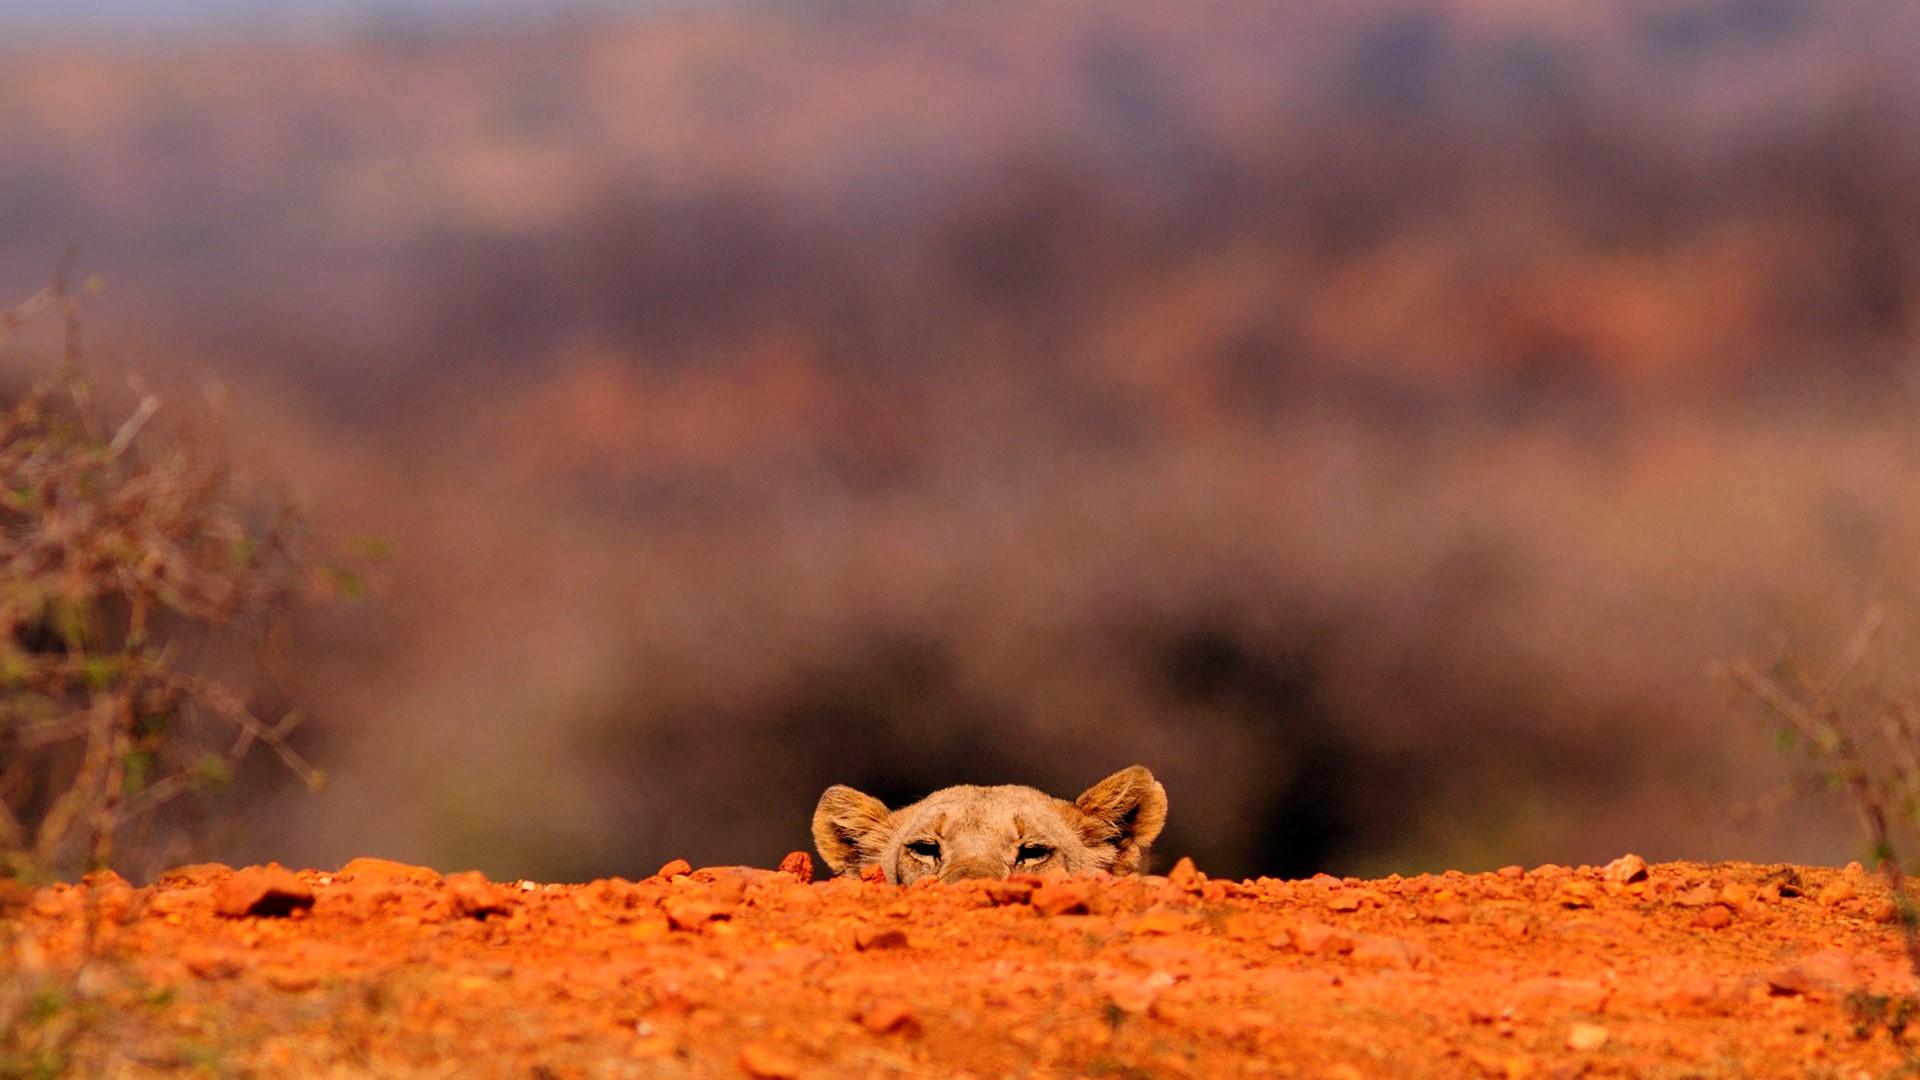 Lioness Panthera leo hiding Jacis Tree Lodge Madikwe Game 1920x1080